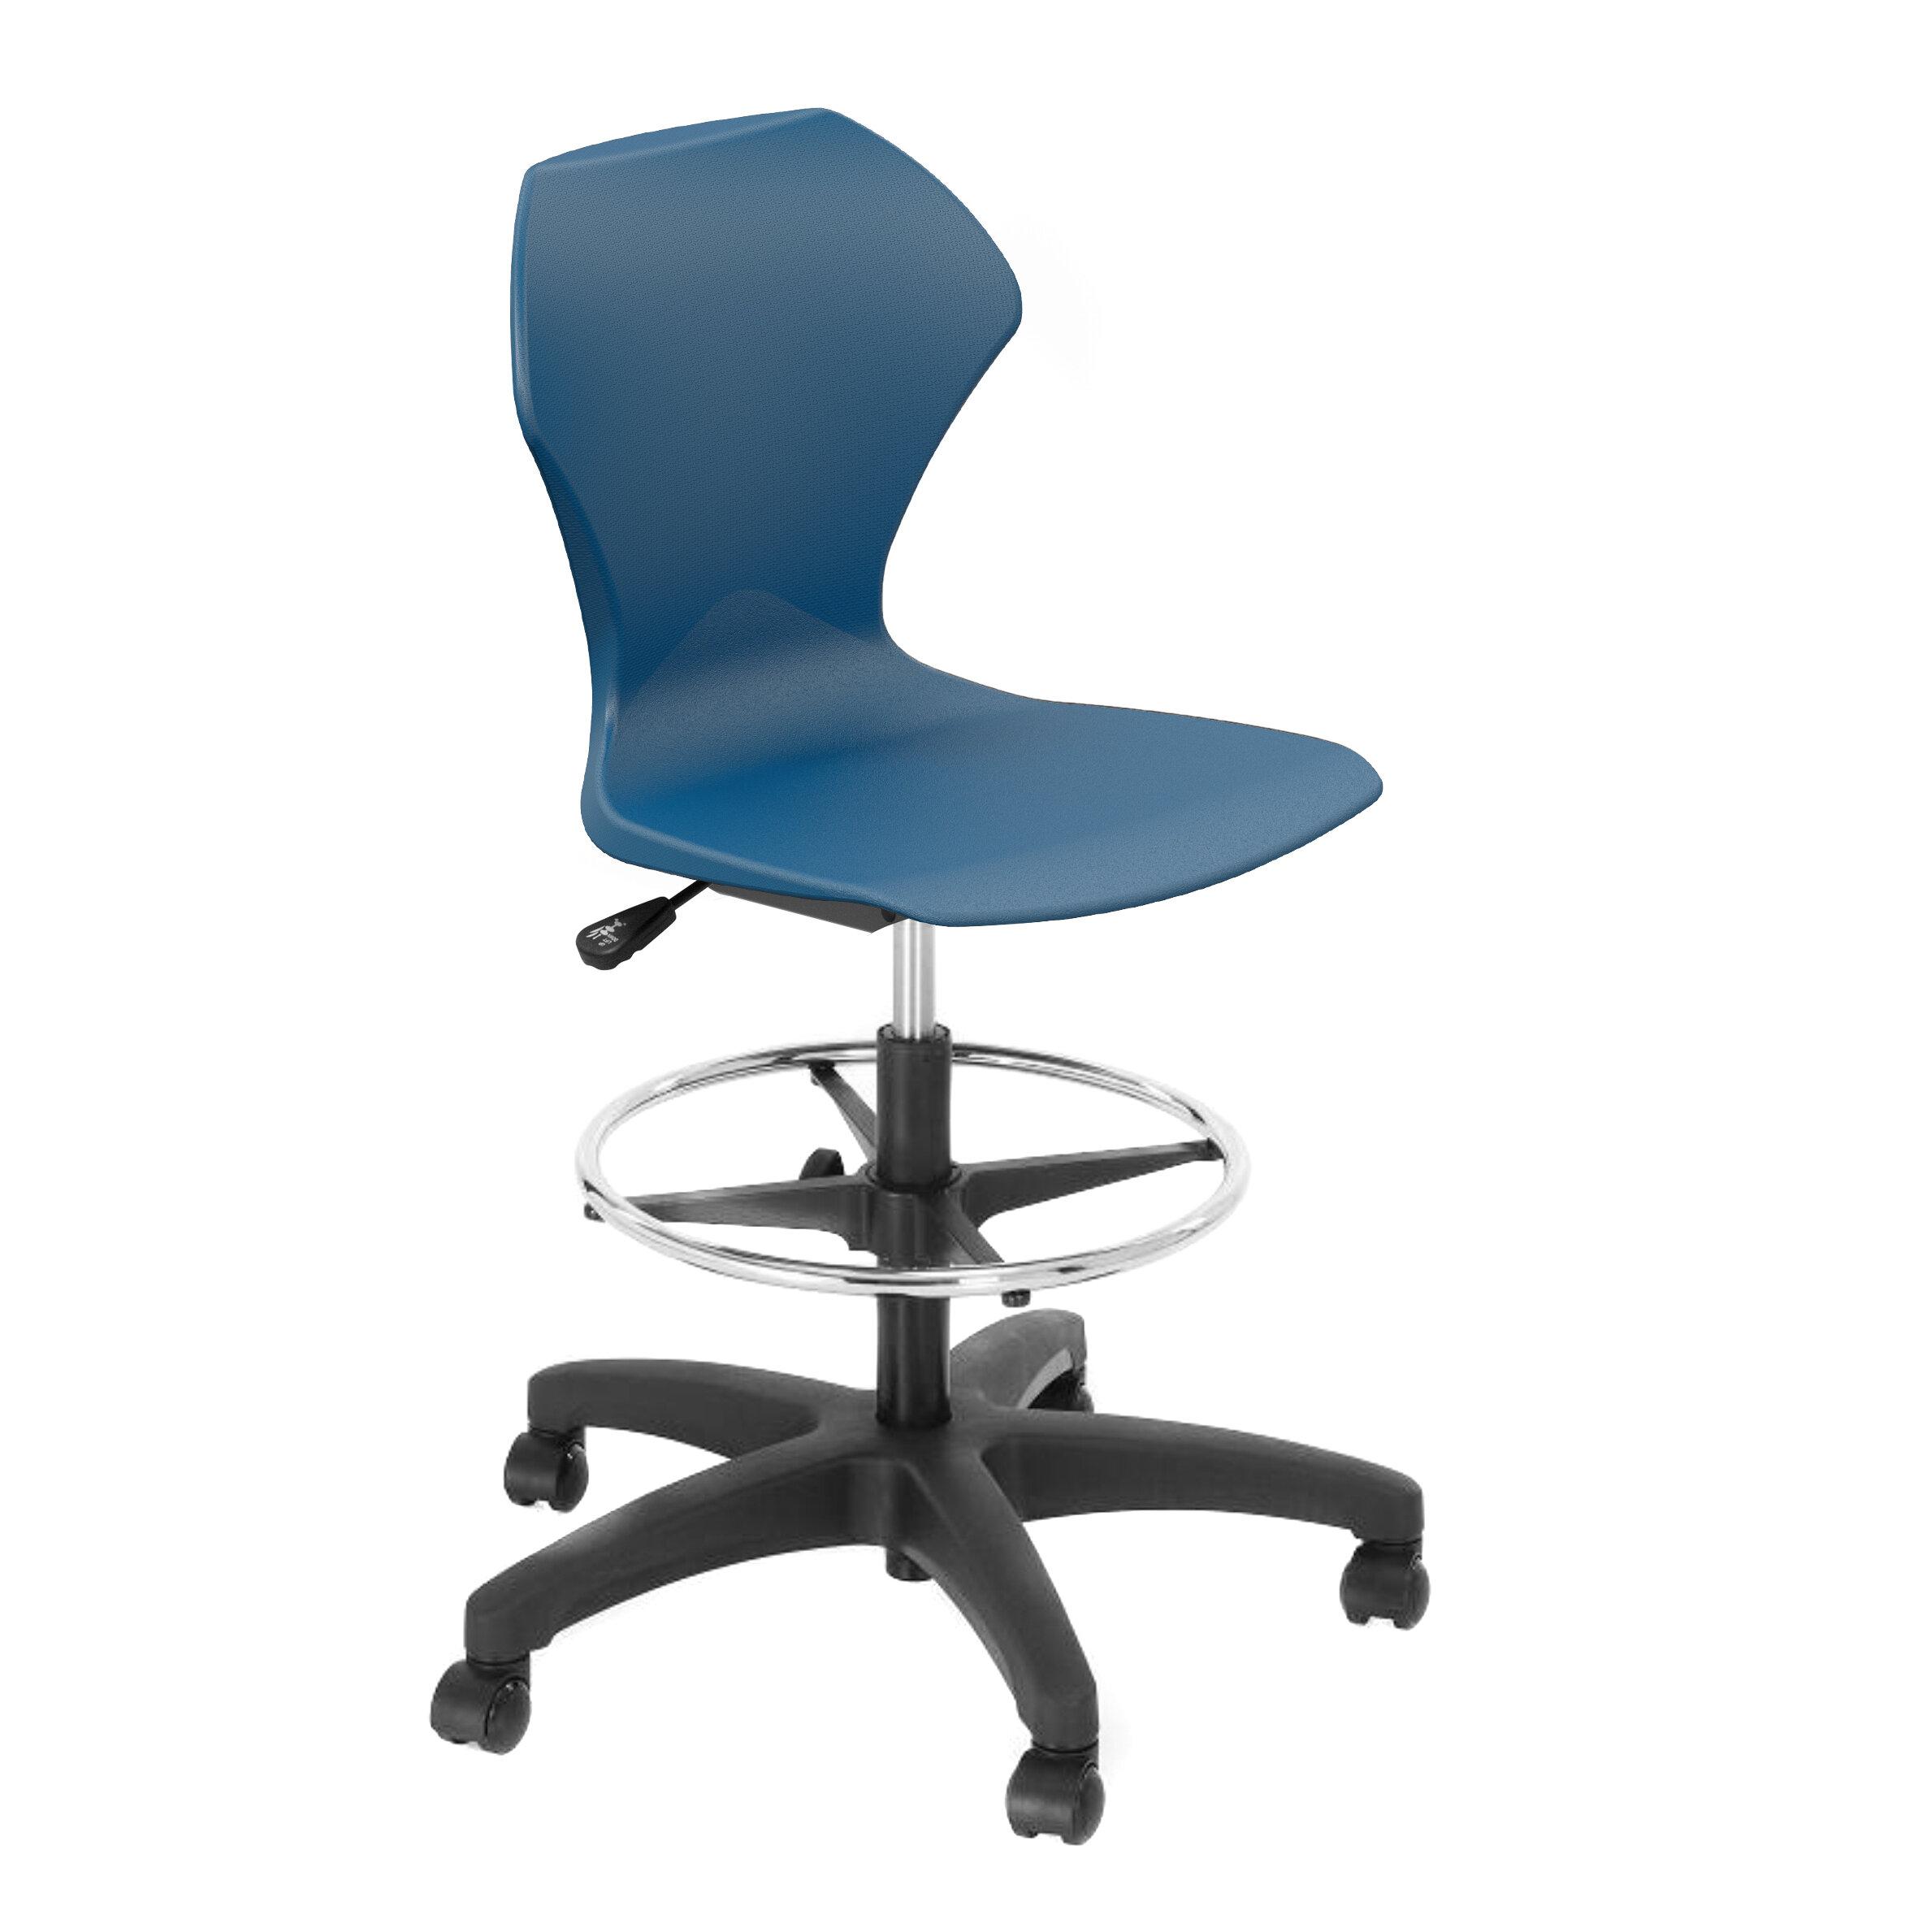 Marvelous Apex Series Drafting Chair Uwap Interior Chair Design Uwaporg